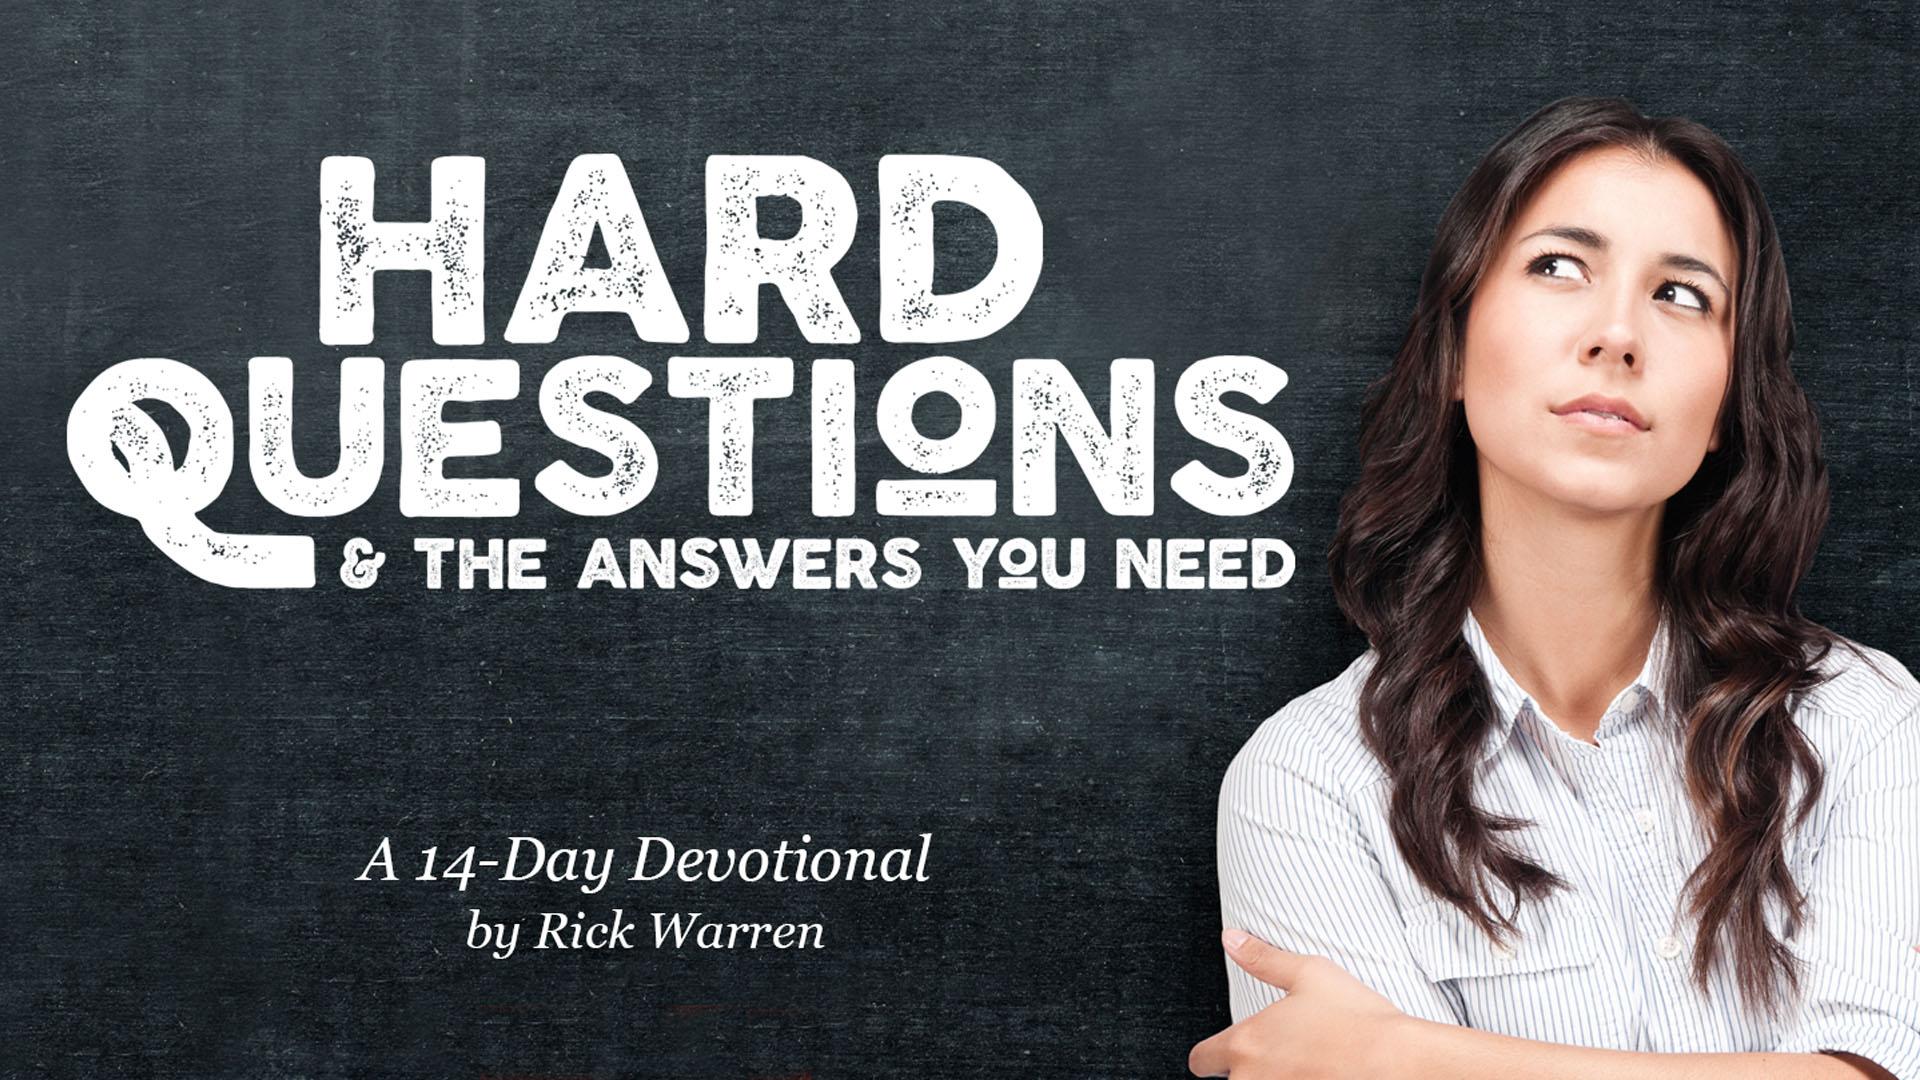 hard questions devotional.jpg